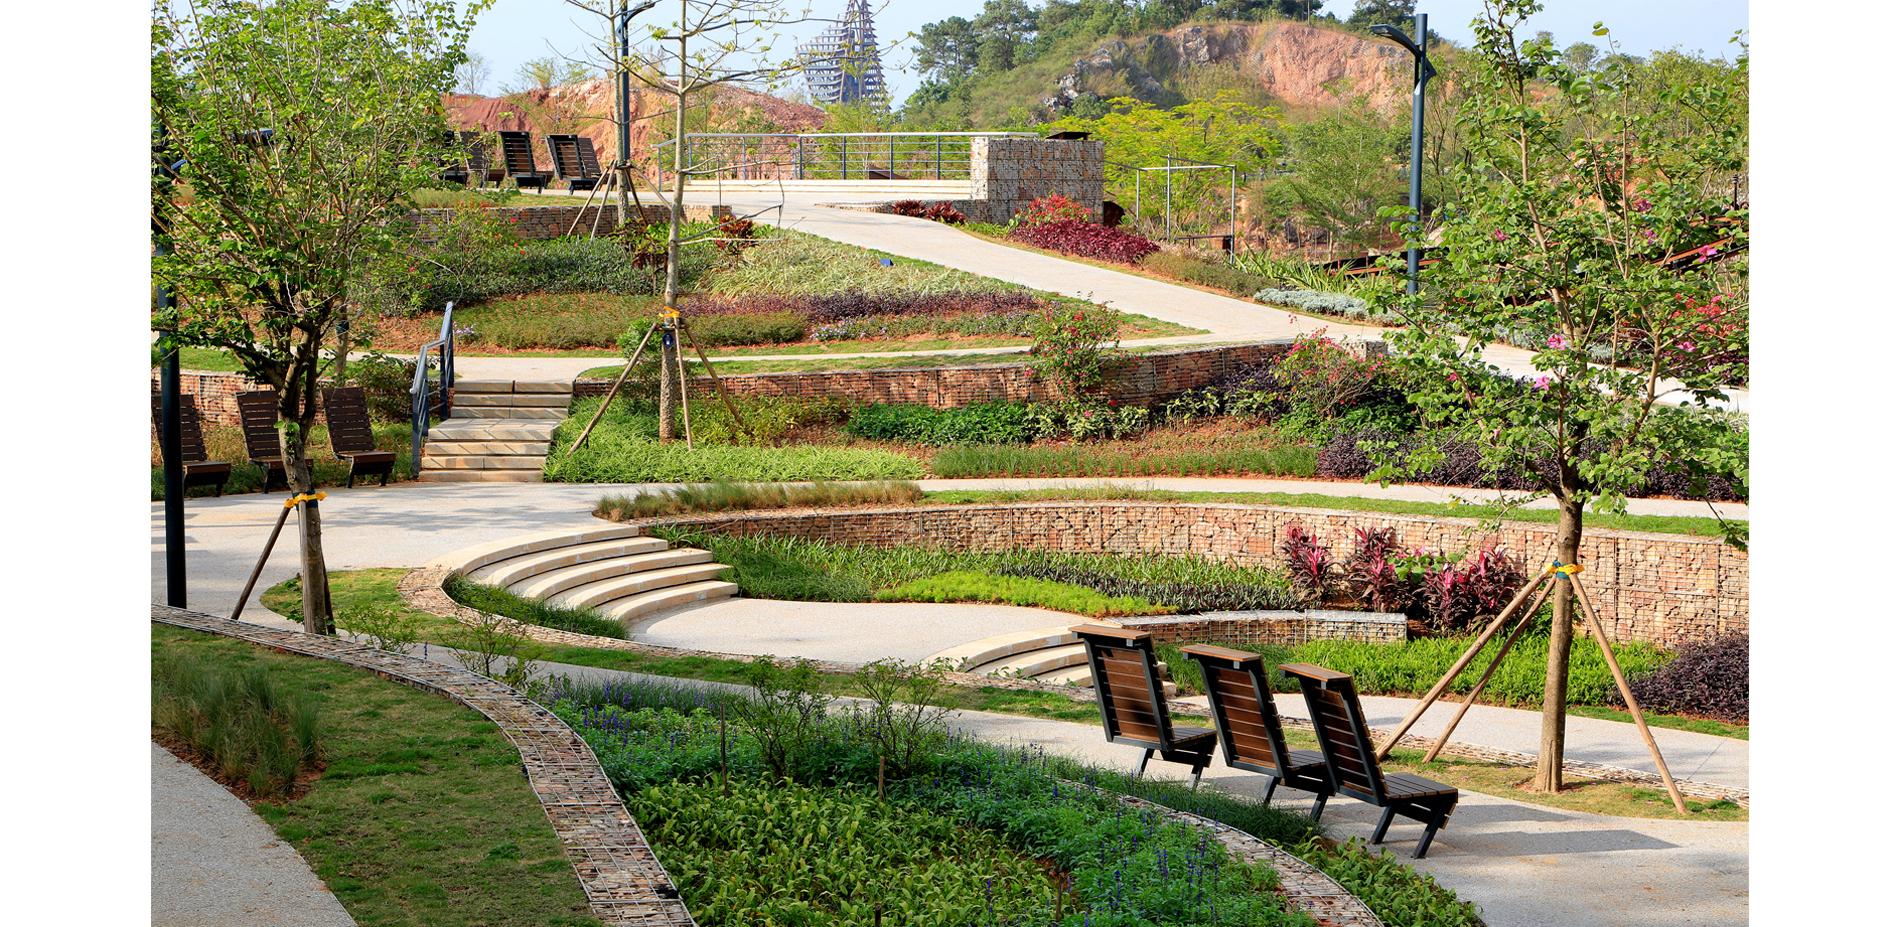 Romantic and Gorgeous Garden (Quarry No. 6)